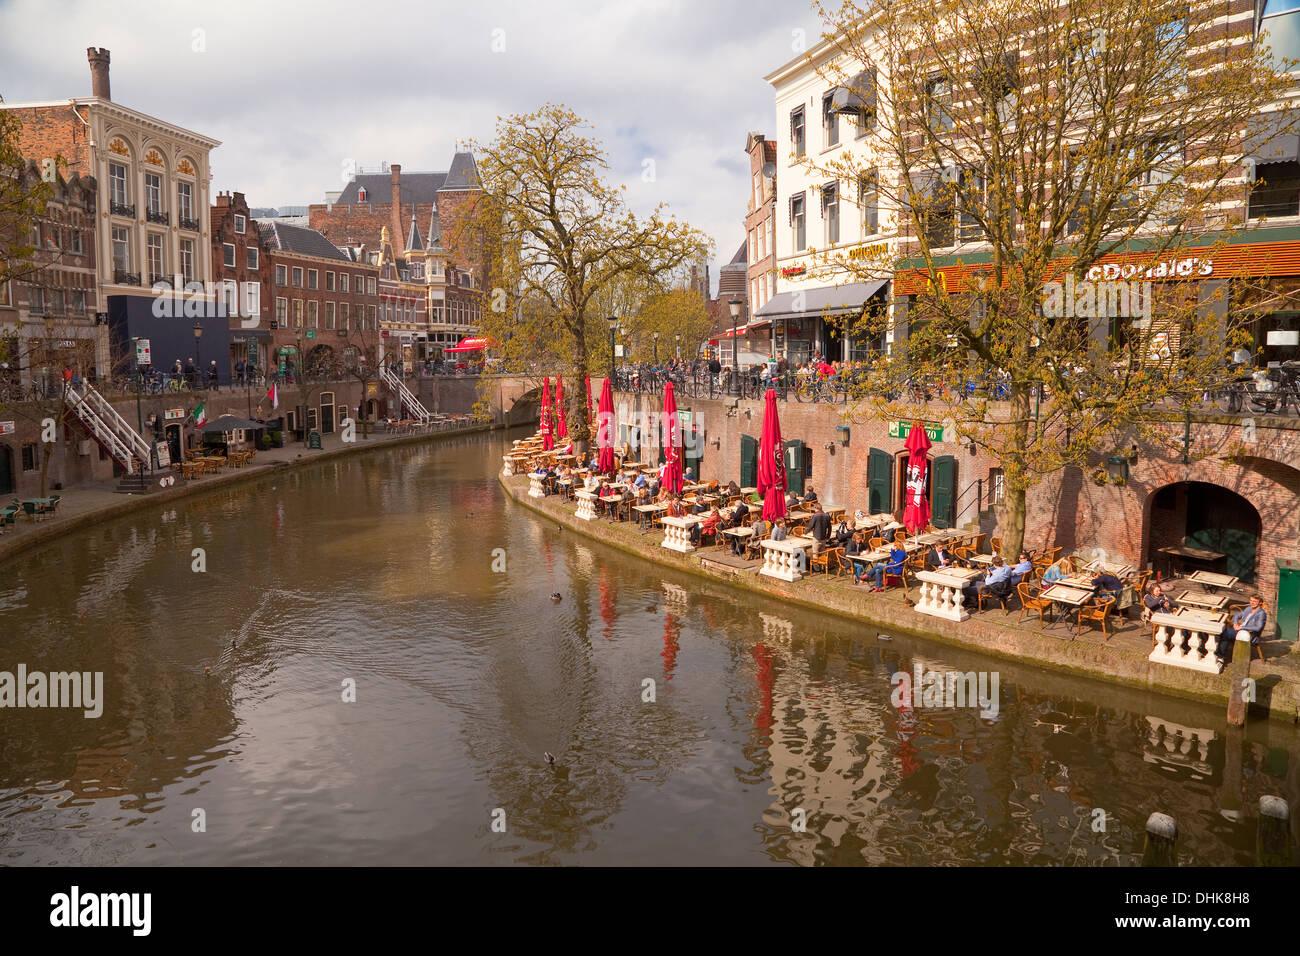 Europe, Netherlands, Utrecht - Stock Image